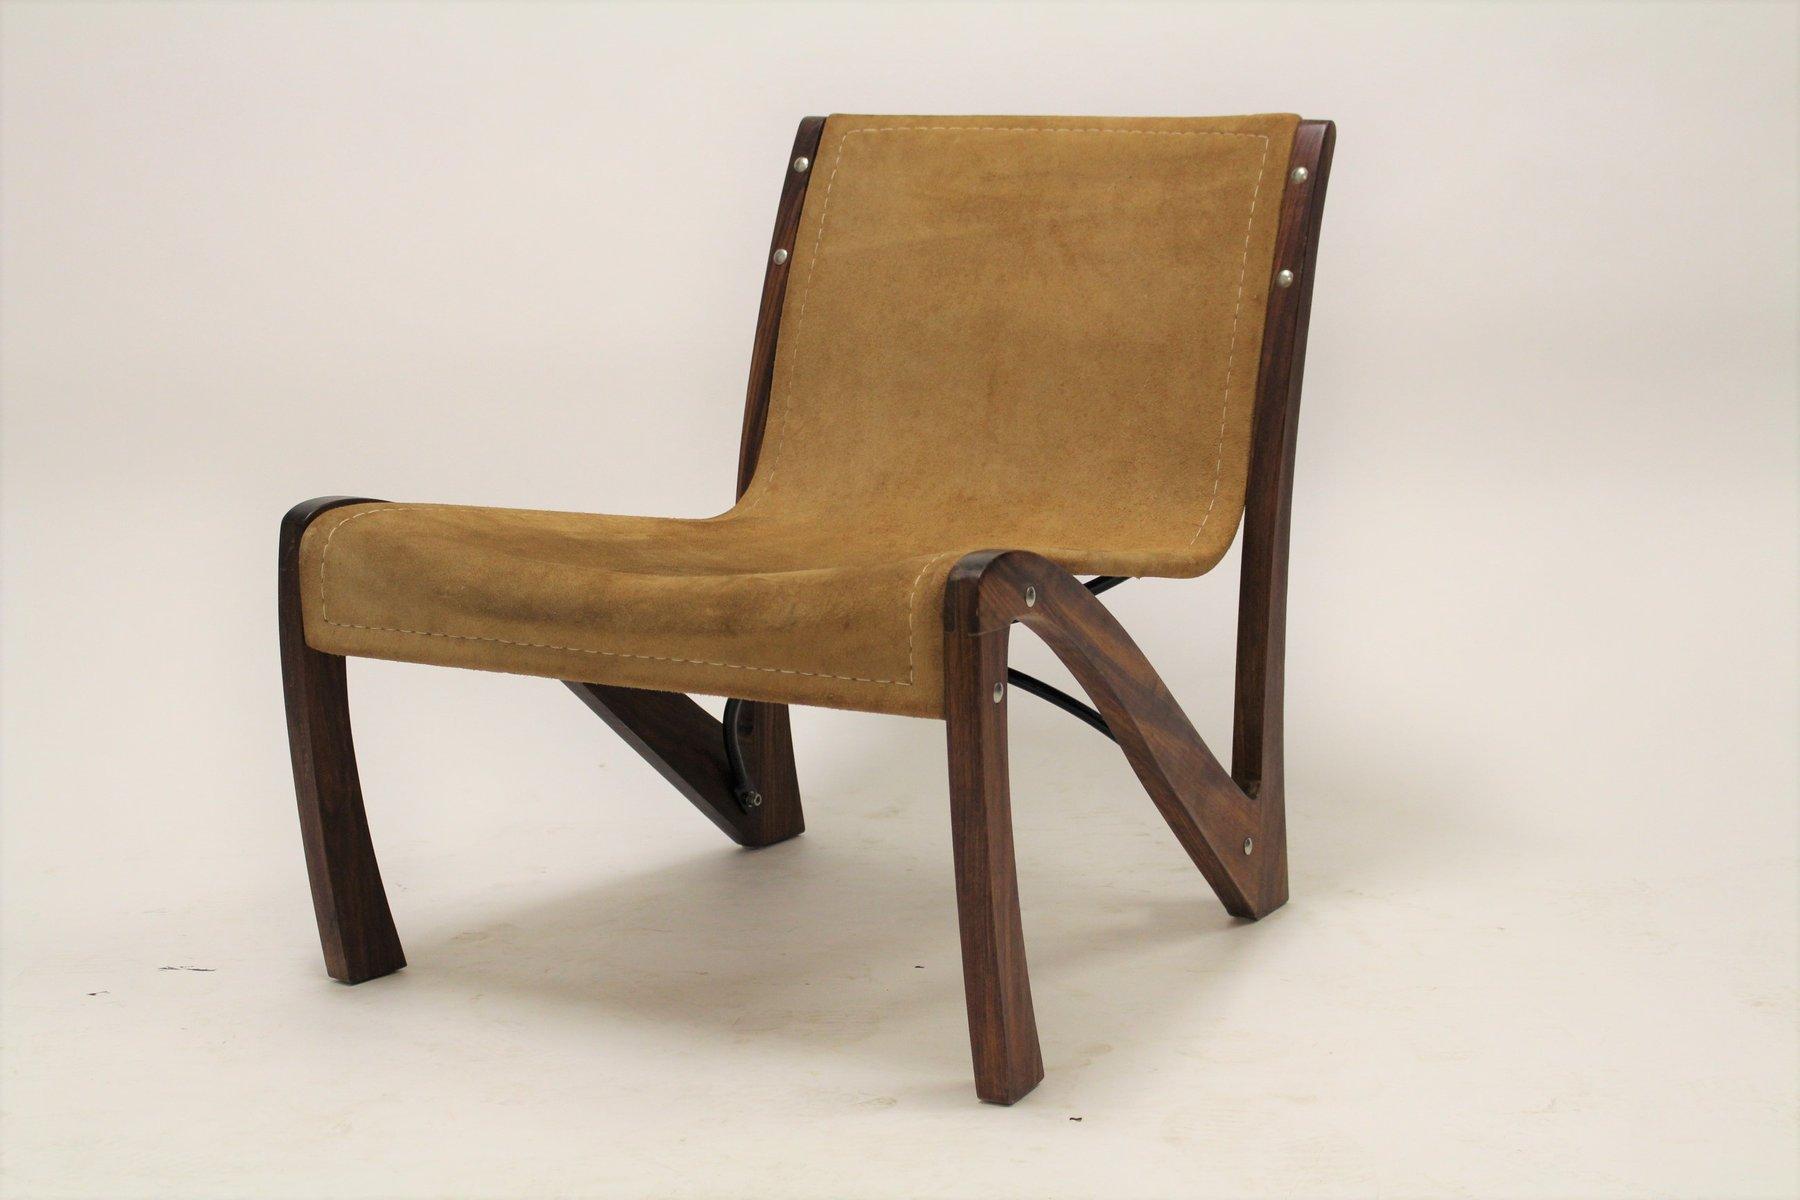 mid century stuhl 1960er bei pamono kaufen. Black Bedroom Furniture Sets. Home Design Ideas